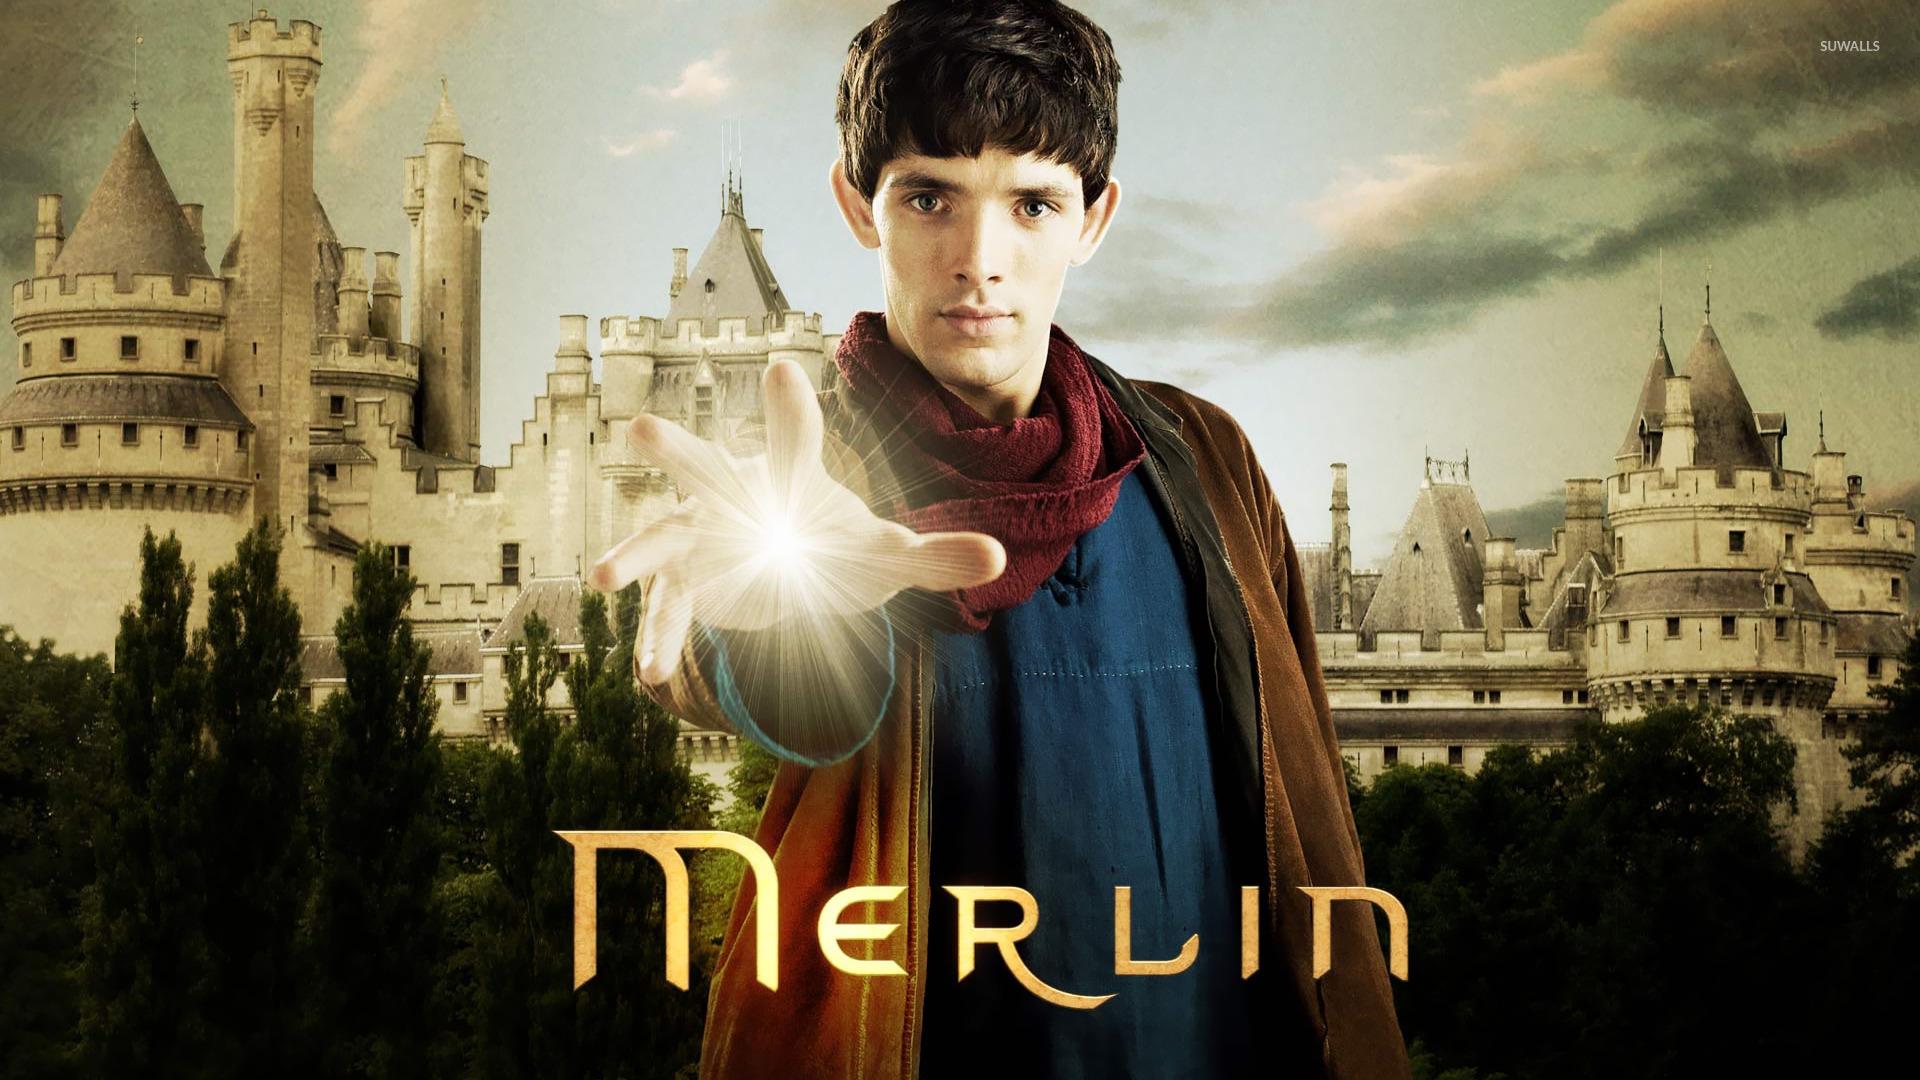 Tardis Wallpaper Hd Merlin Wallpaper Tv Show Wallpapers 15011